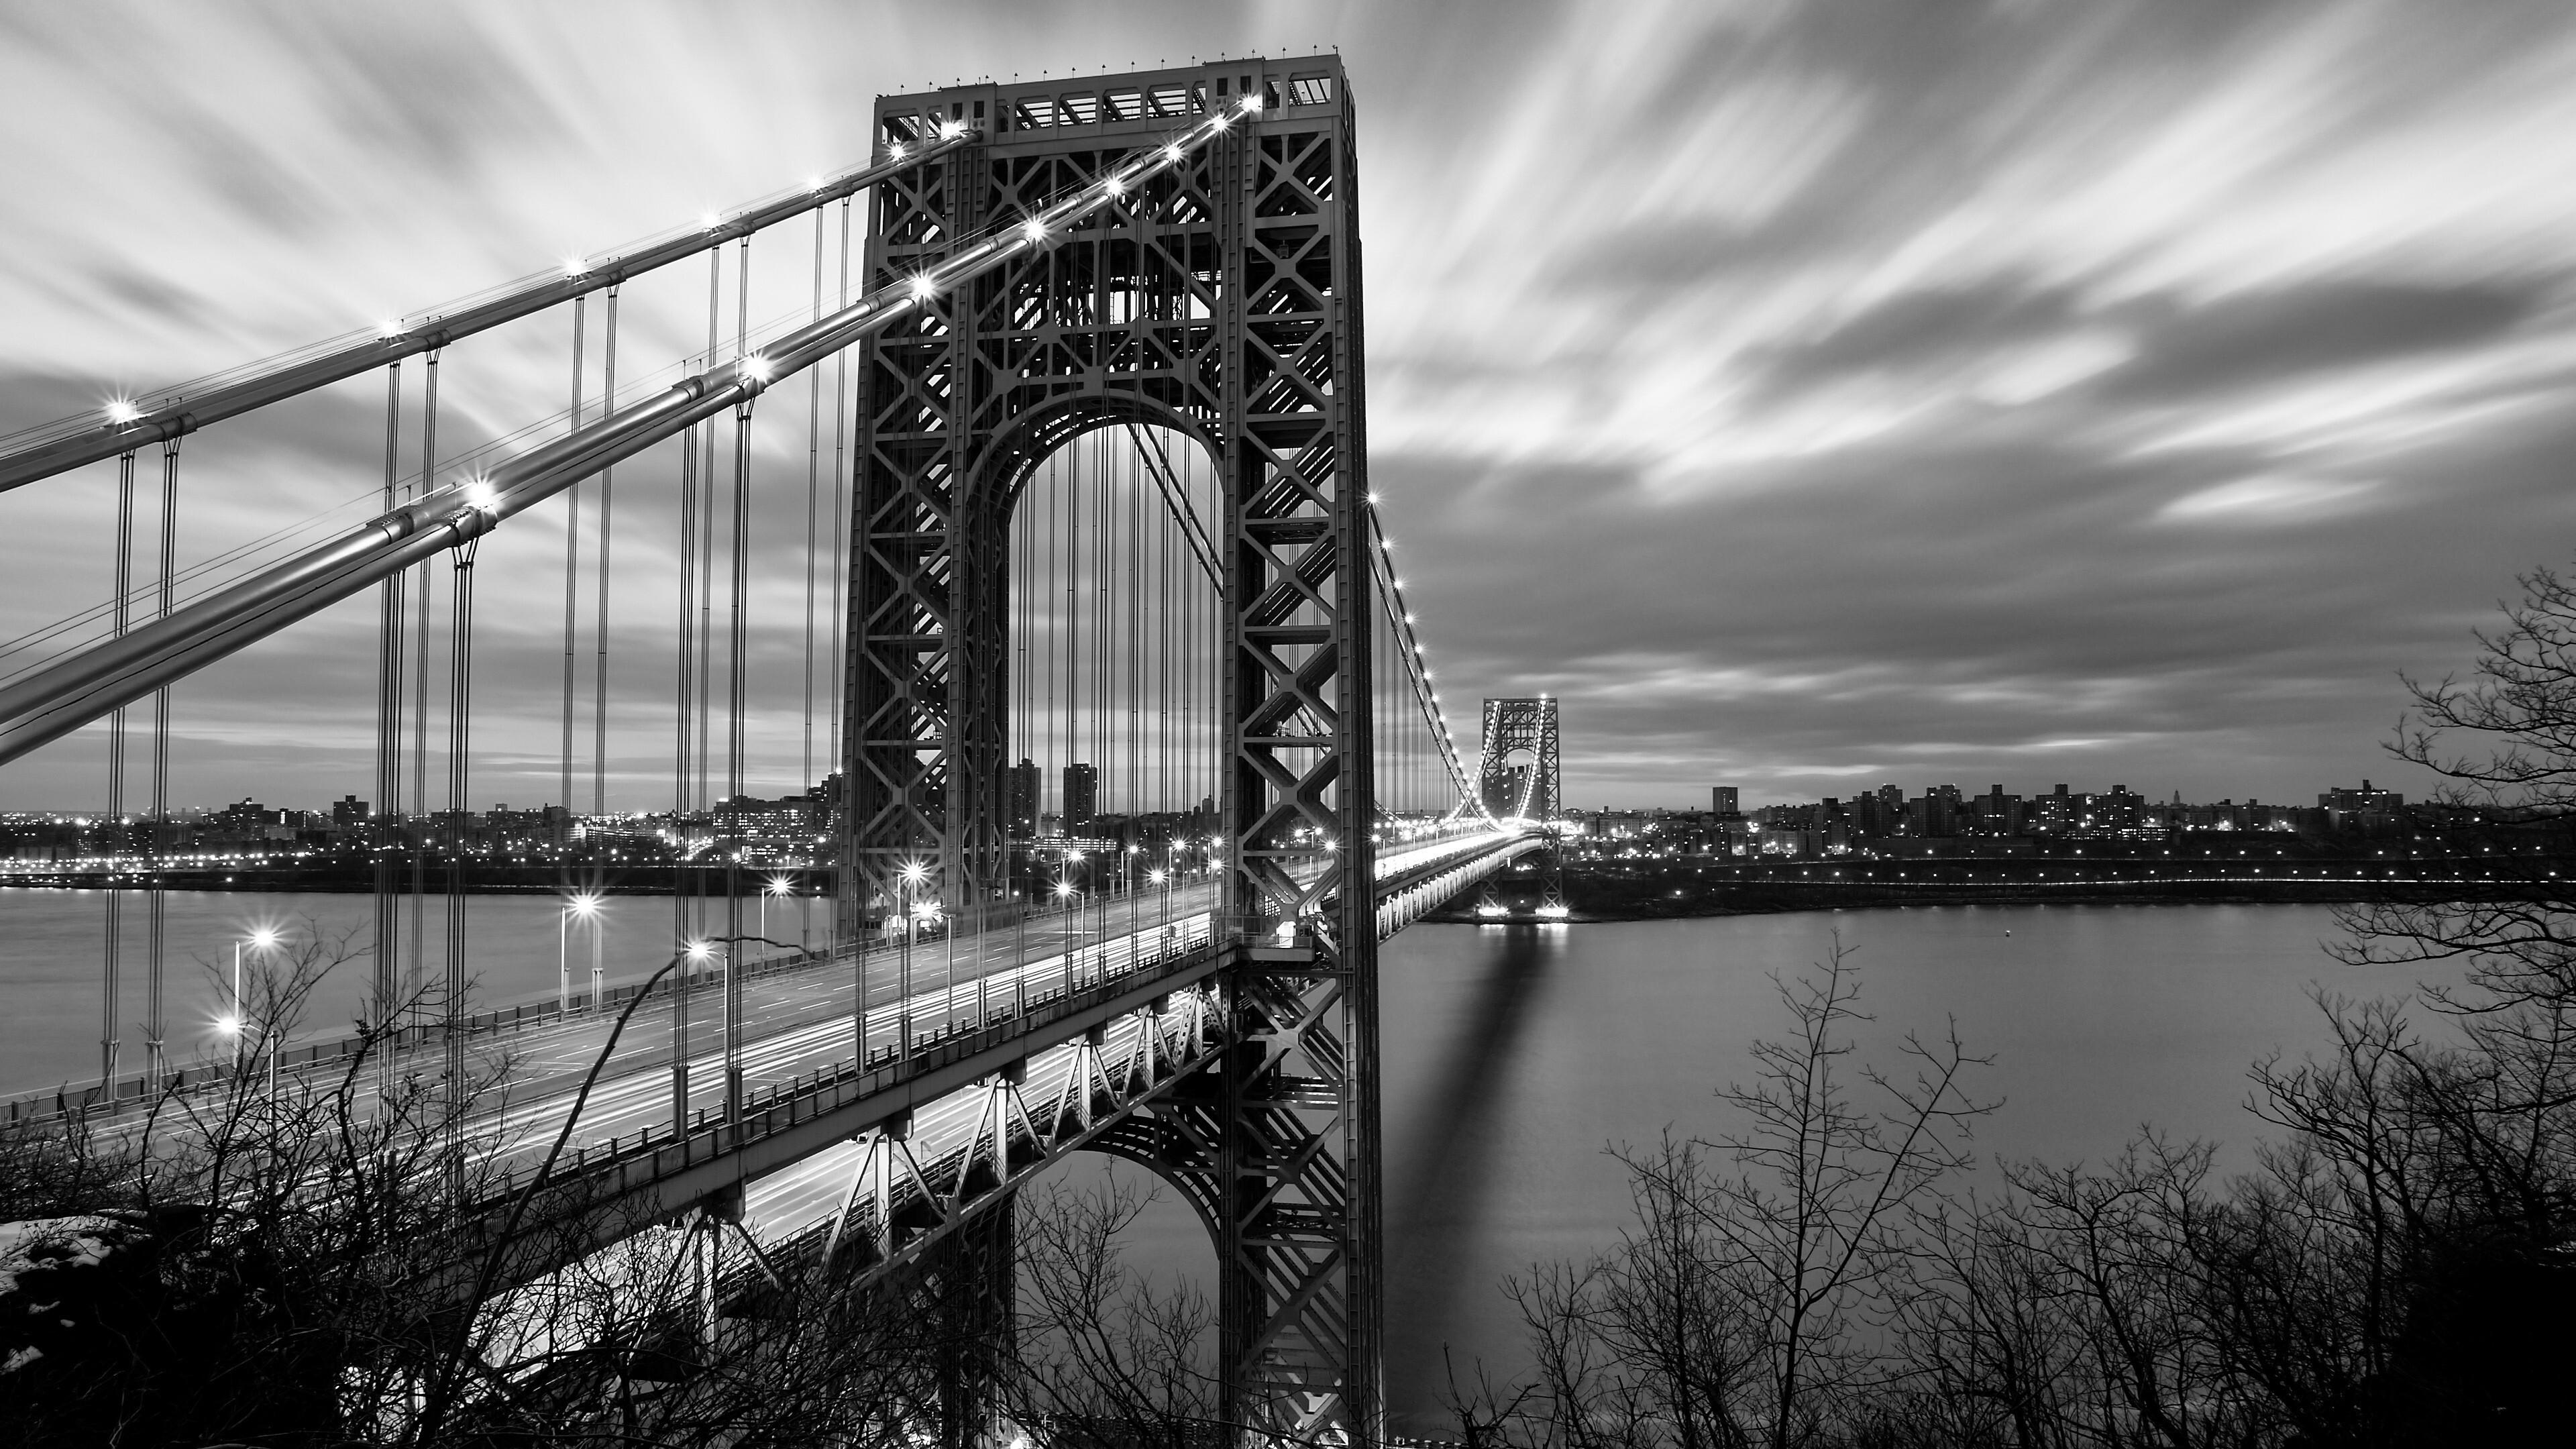 Bridge Black And White Jpg